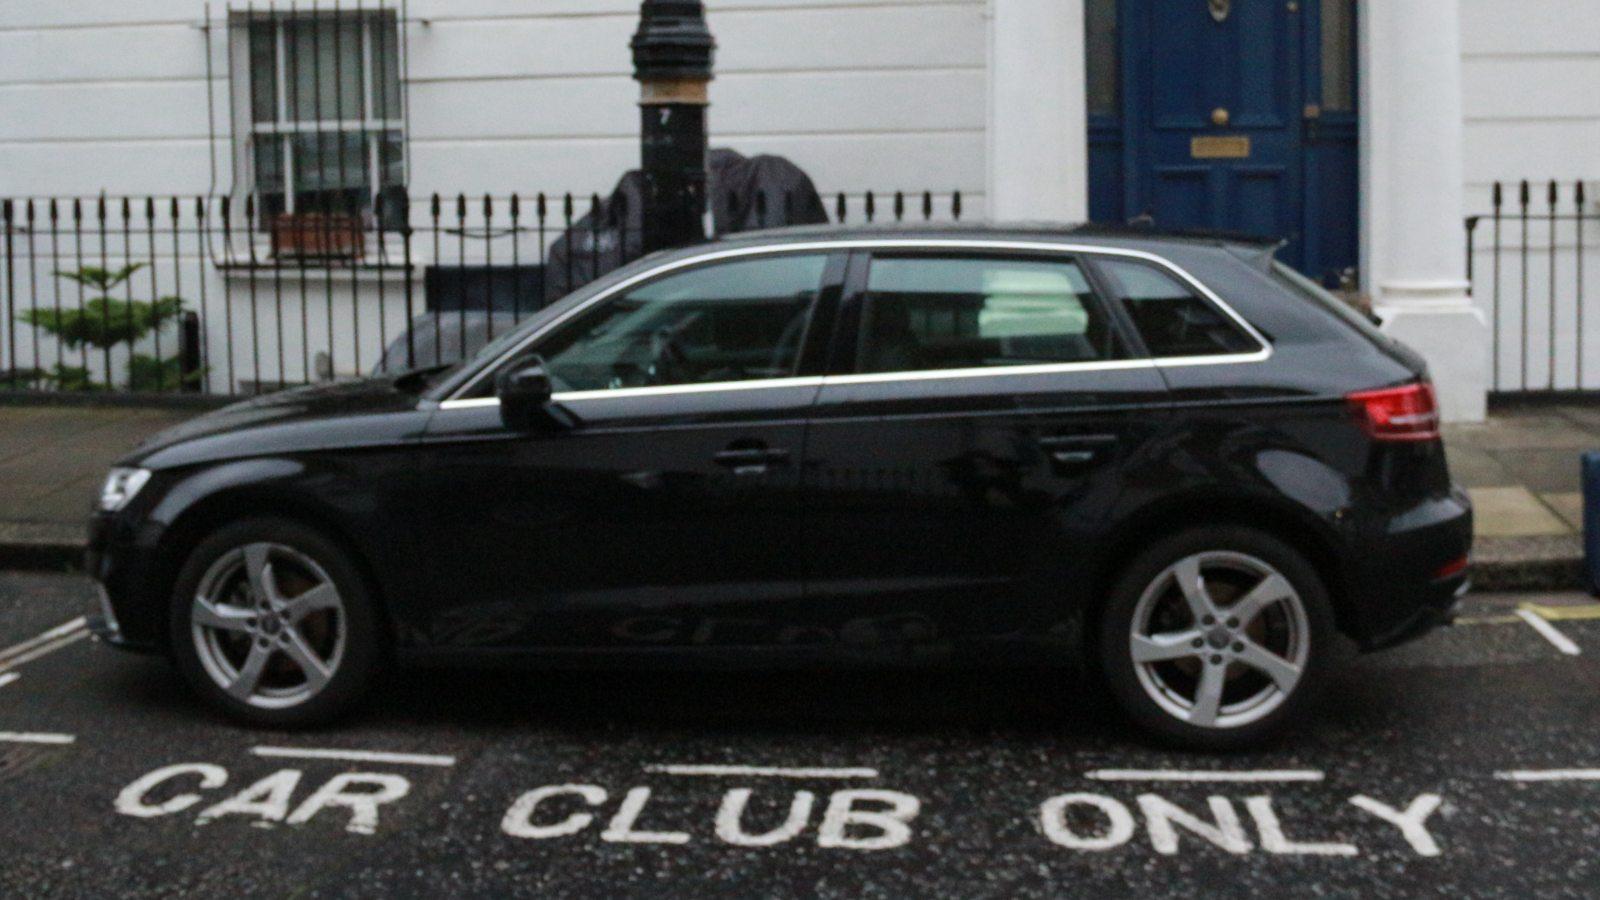 car club car for moving house